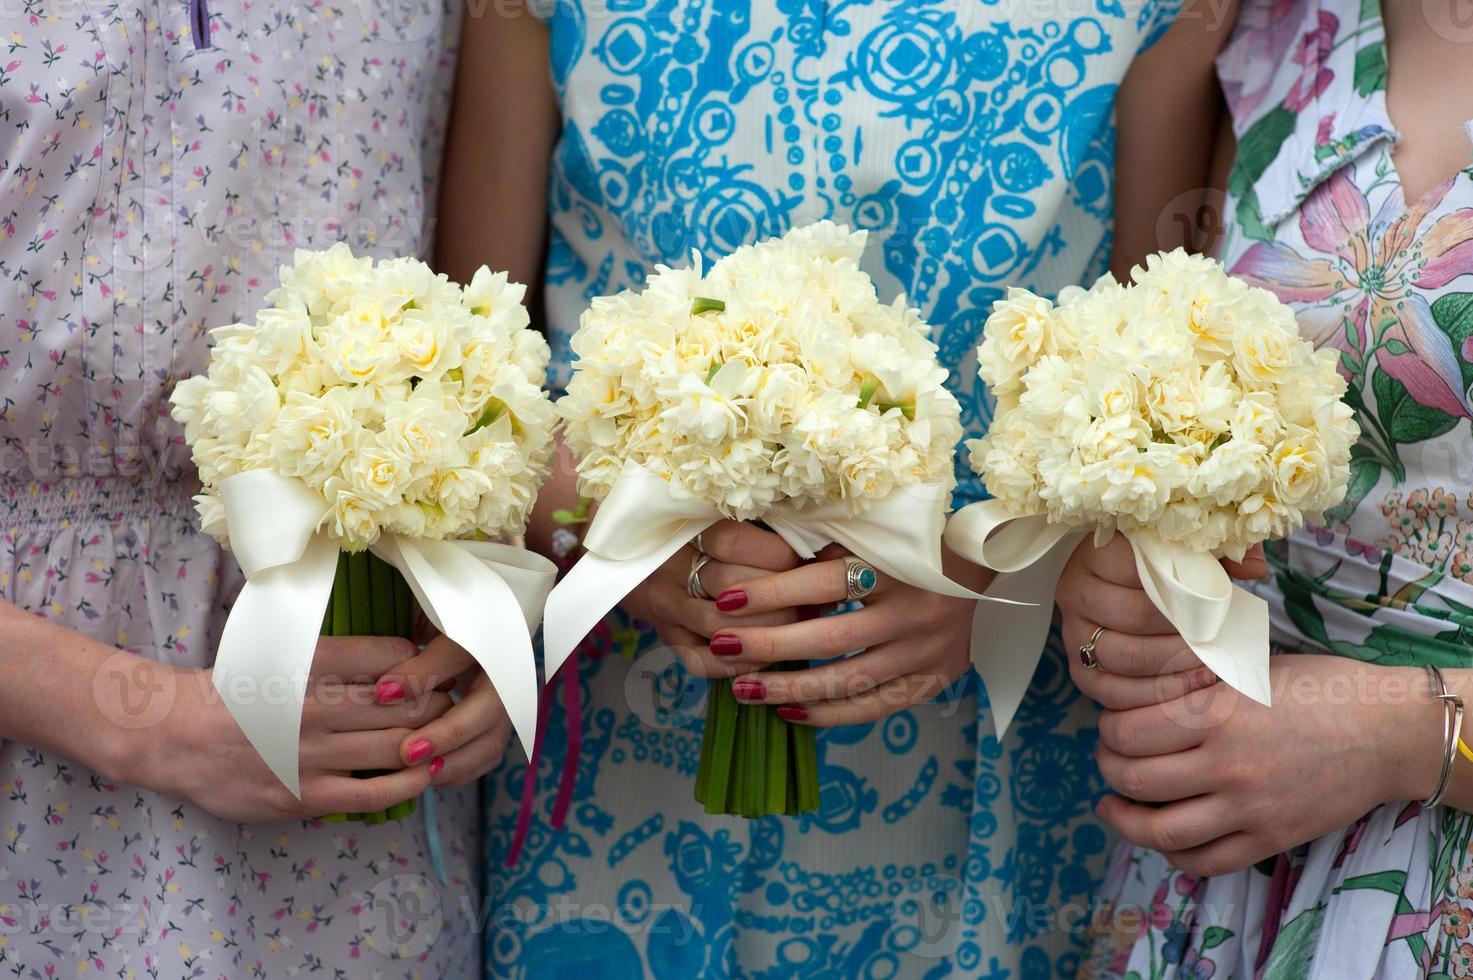 tre mazzi di fiori daffodil tenuti da damigelle foto